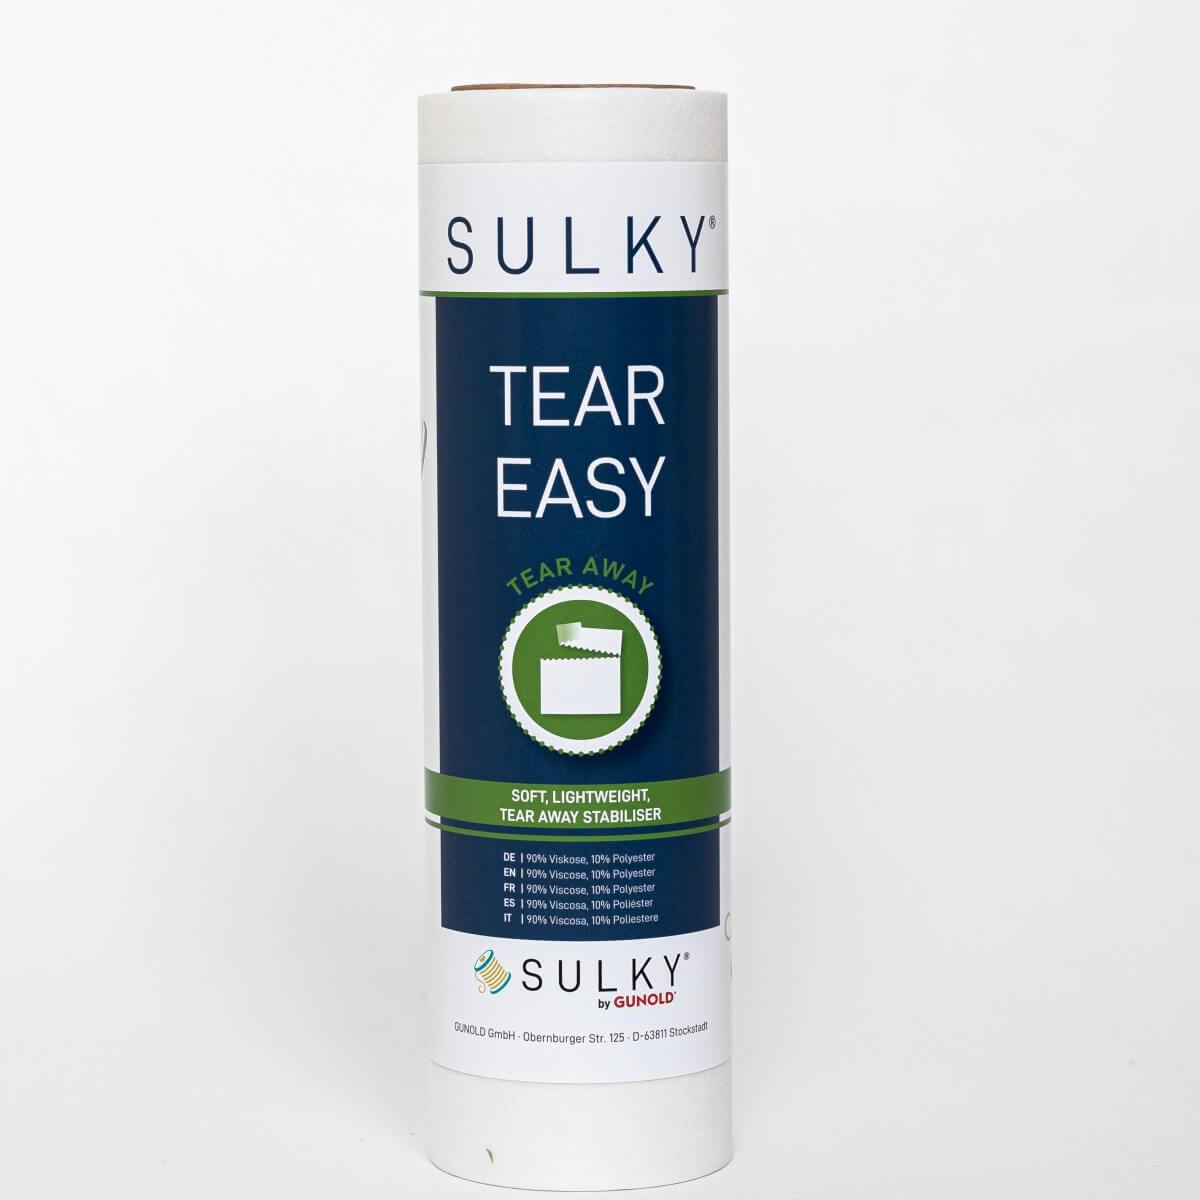 SULKY TEAR EASY weiß, 25cm x 10m